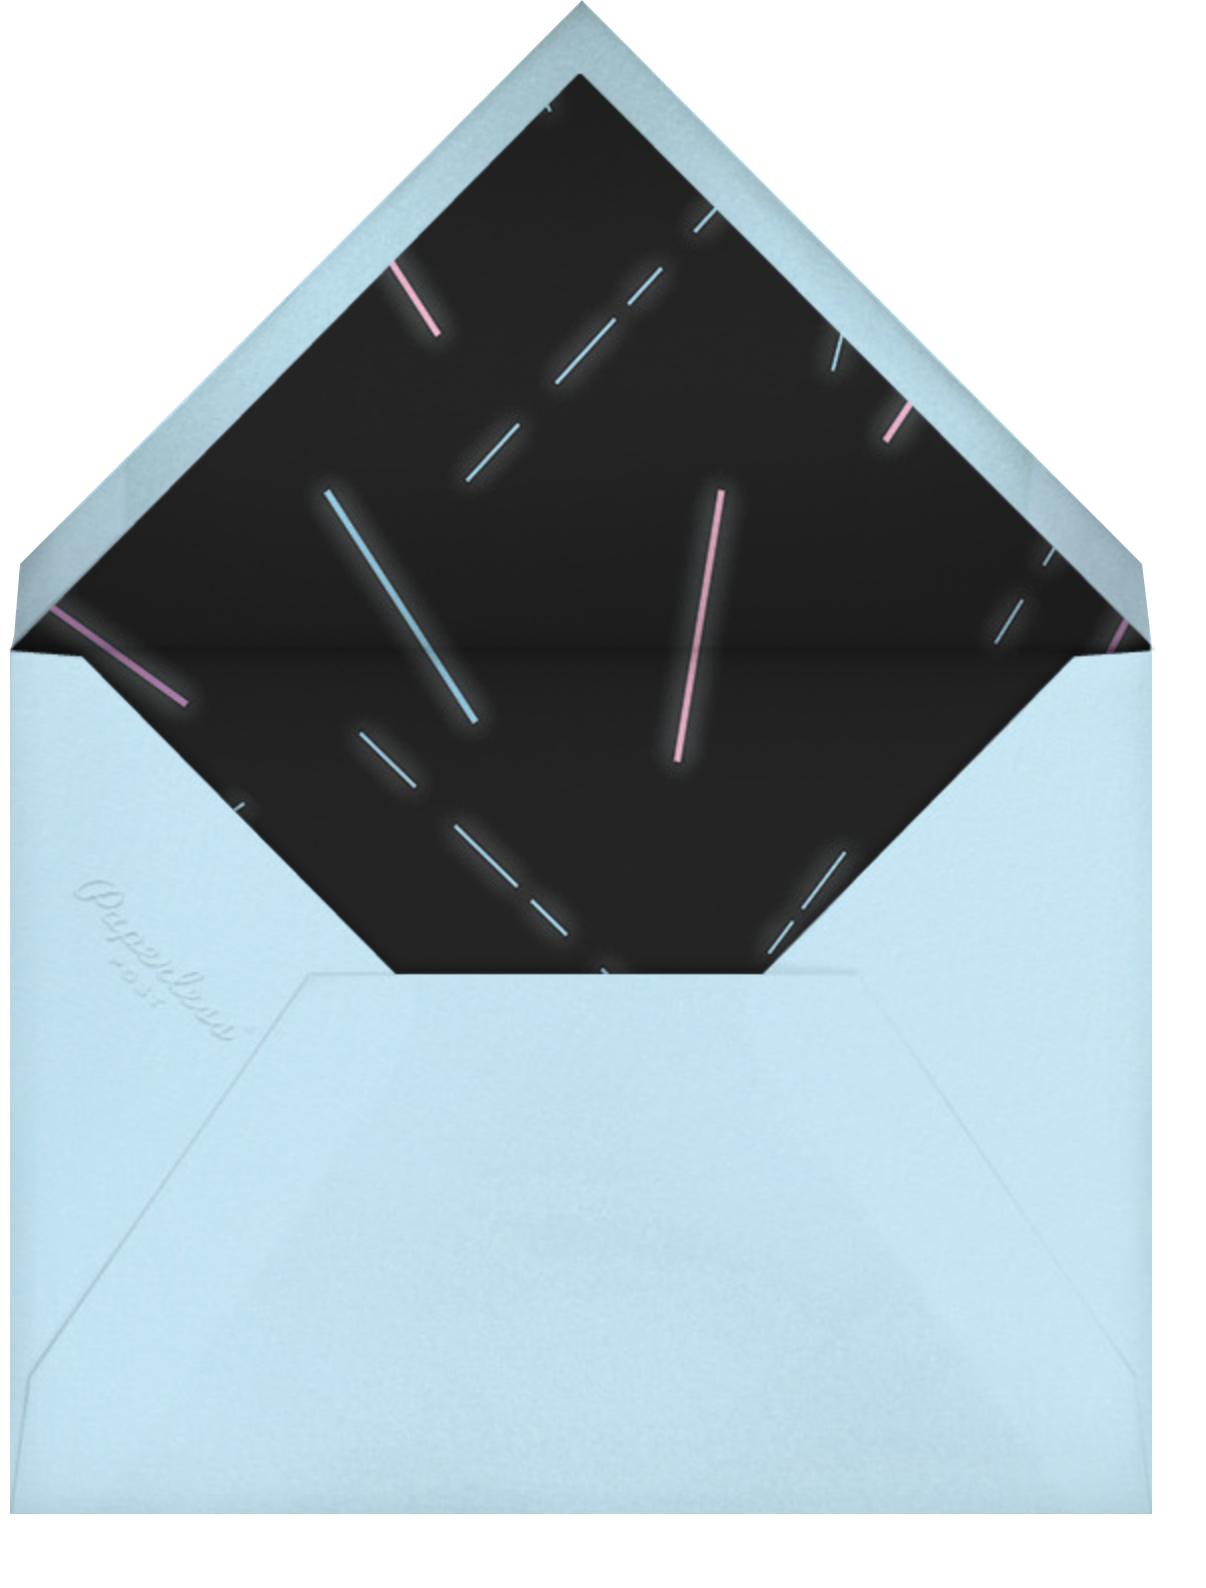 Ultra Light Beams (Tall) - Paperless Post - Envelope